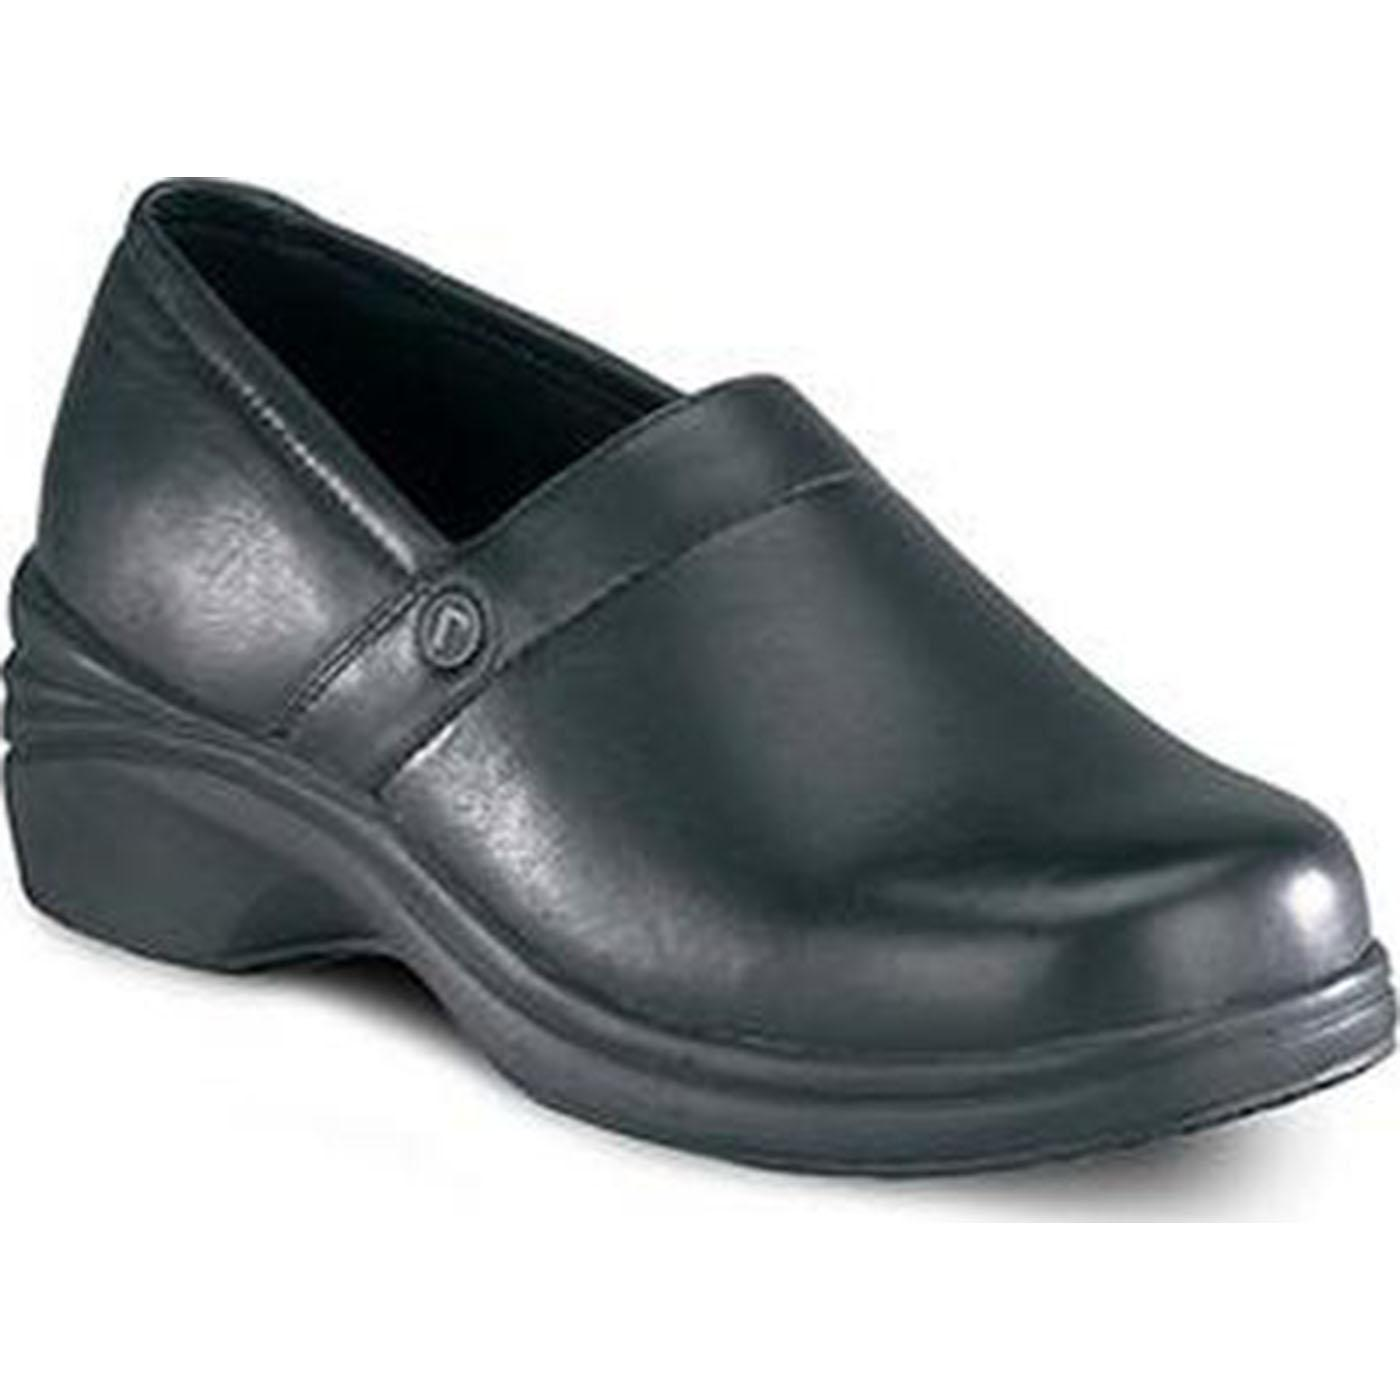 Buy rockport non slip dress shoes cheap